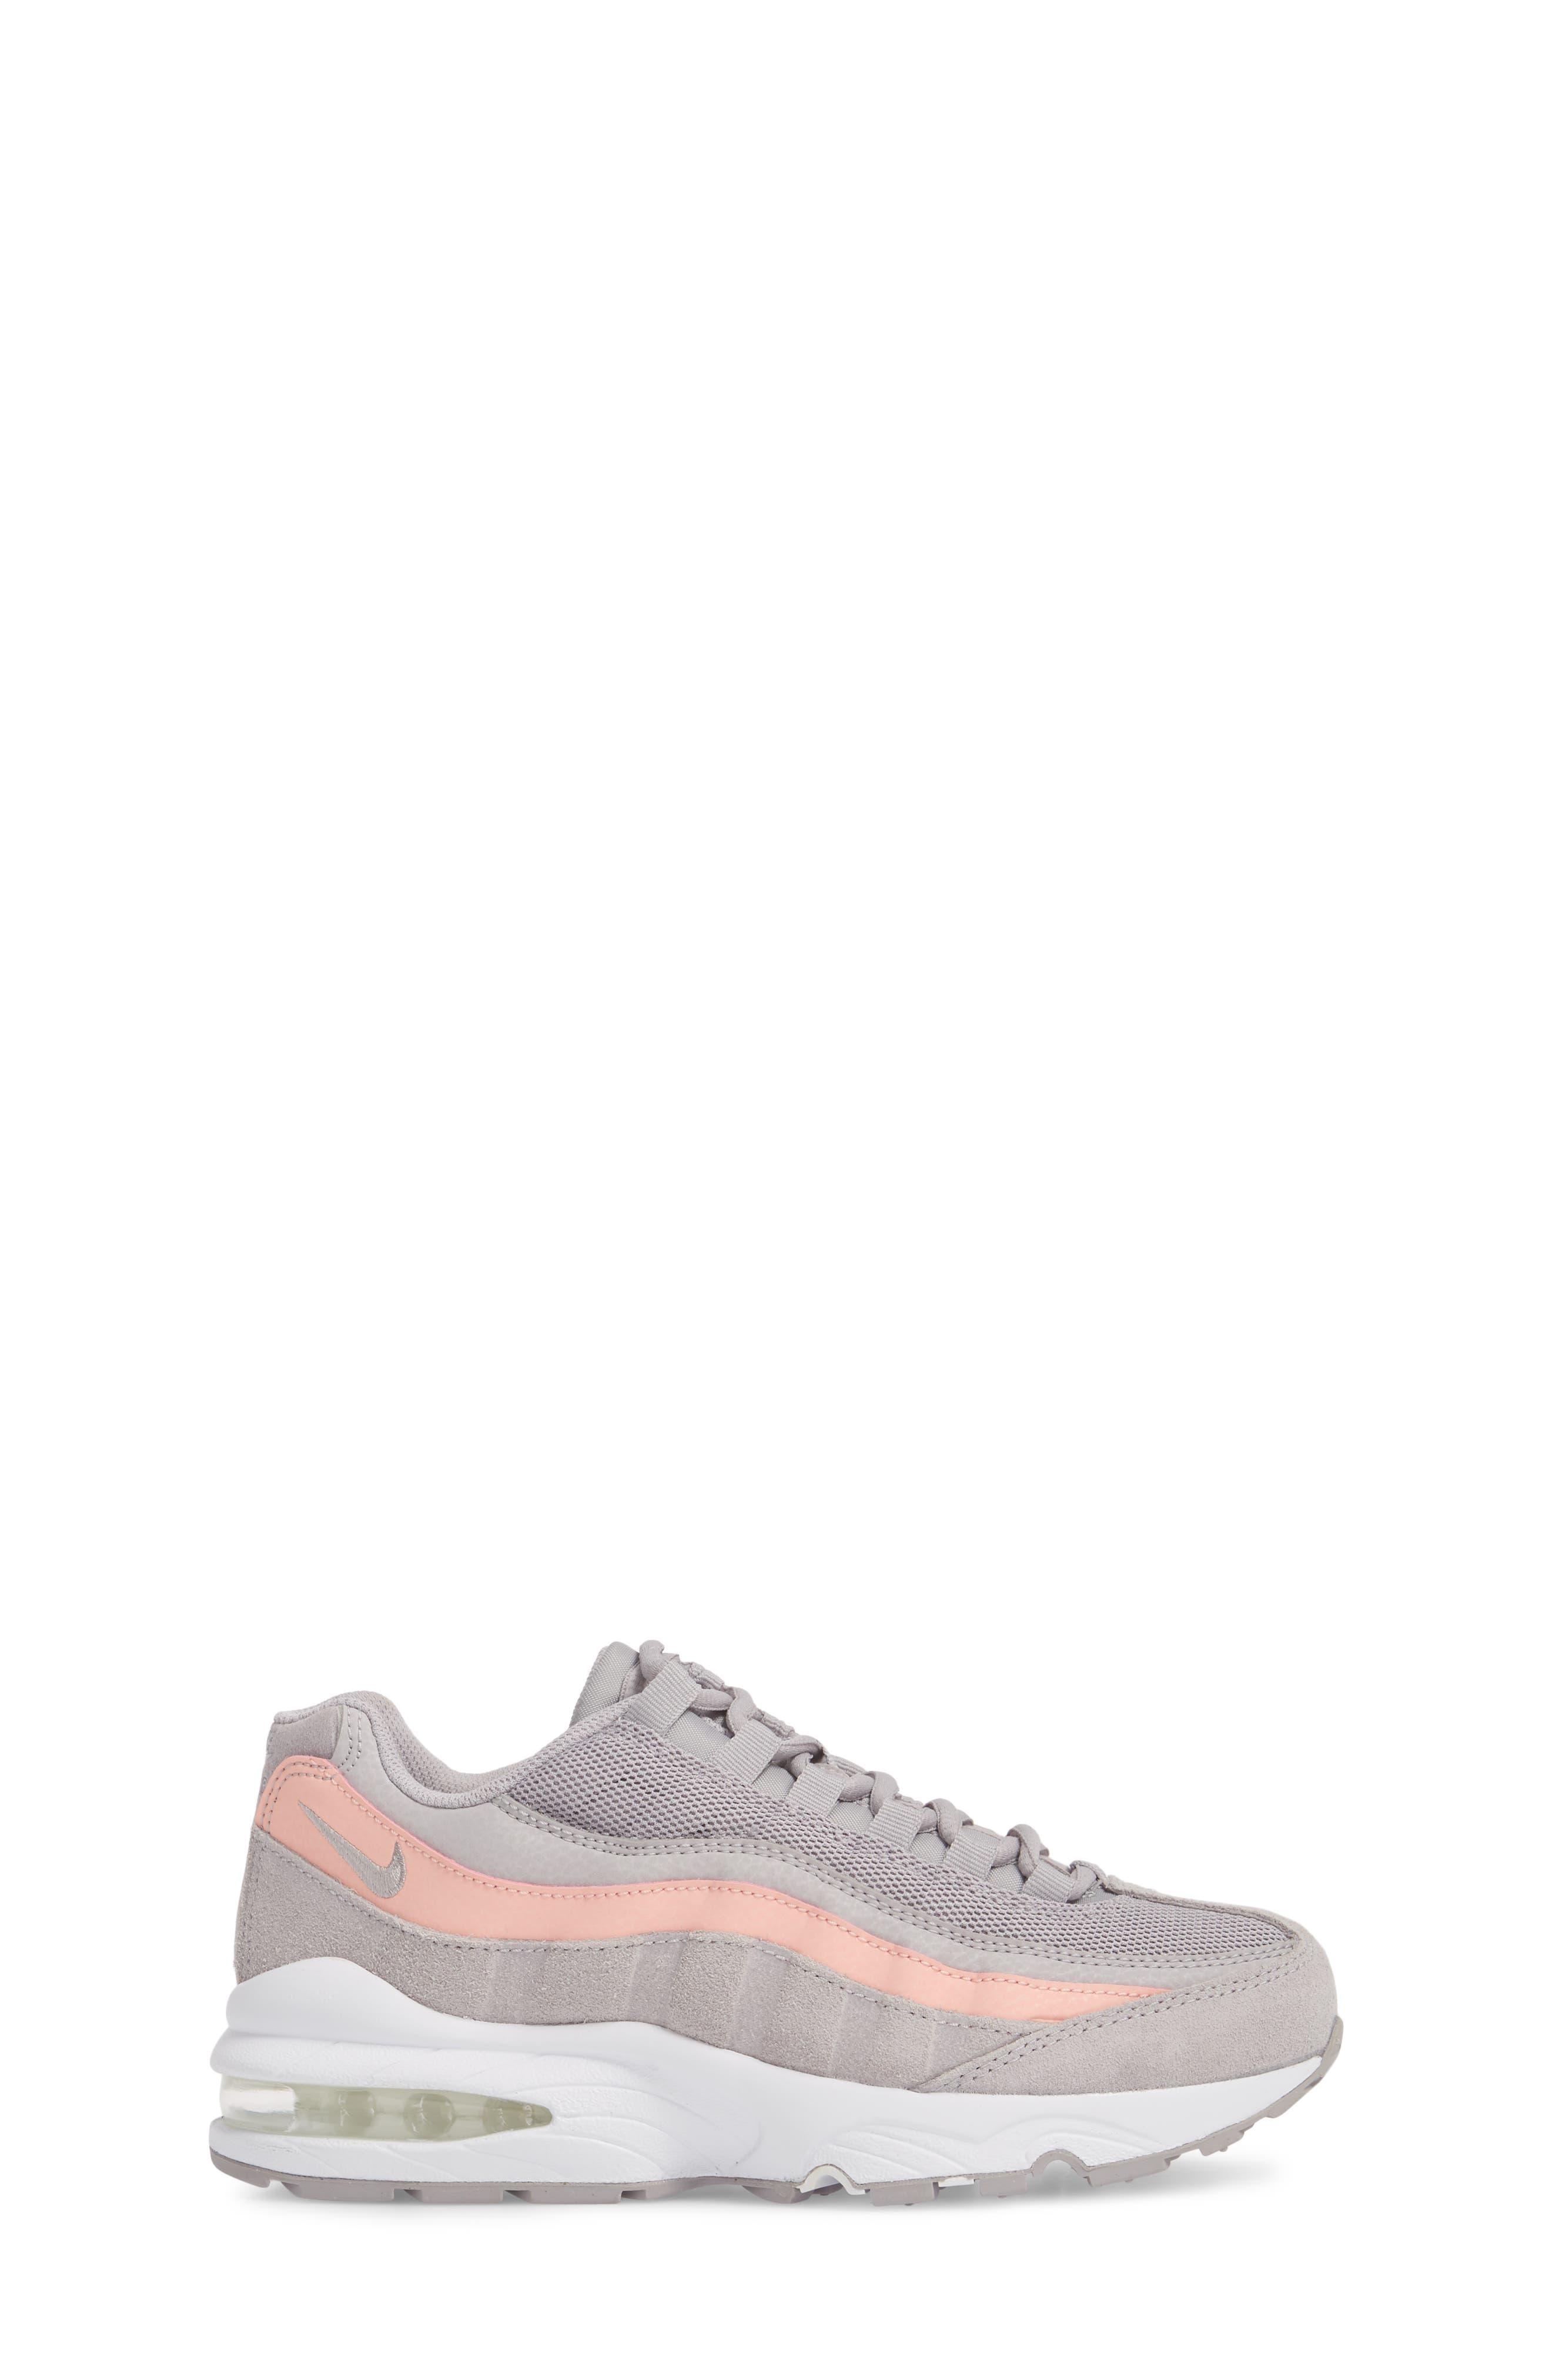 Air Max '95 LE Sneaker,                             Alternate thumbnail 3, color,                             020